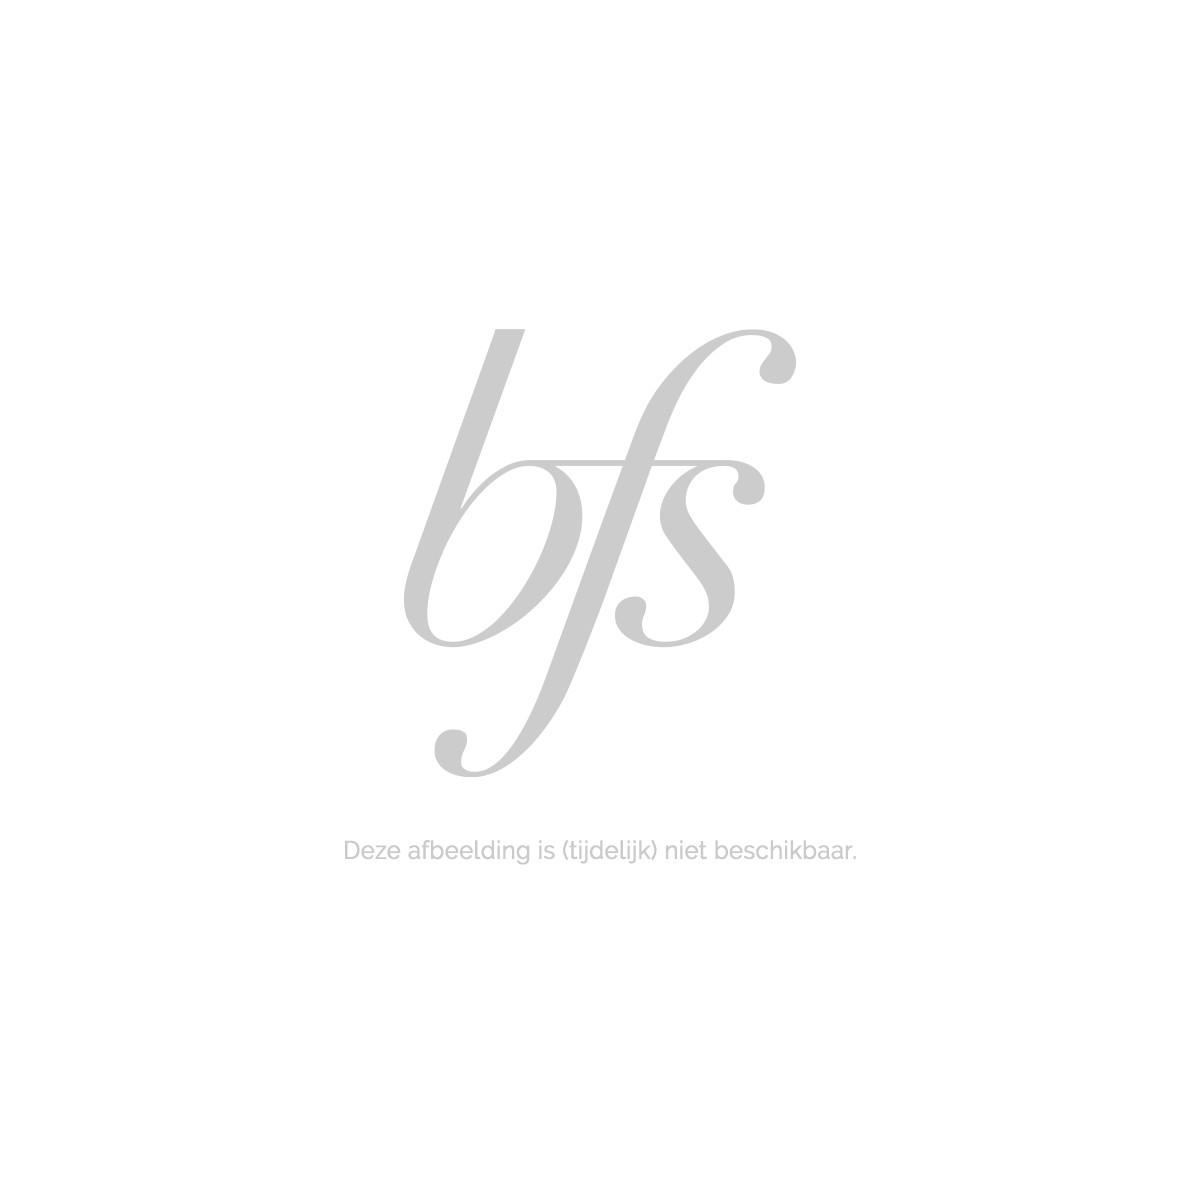 Lancôme Matte Shaker Lip Gloss #189 RedY In 5 6,2 Ml